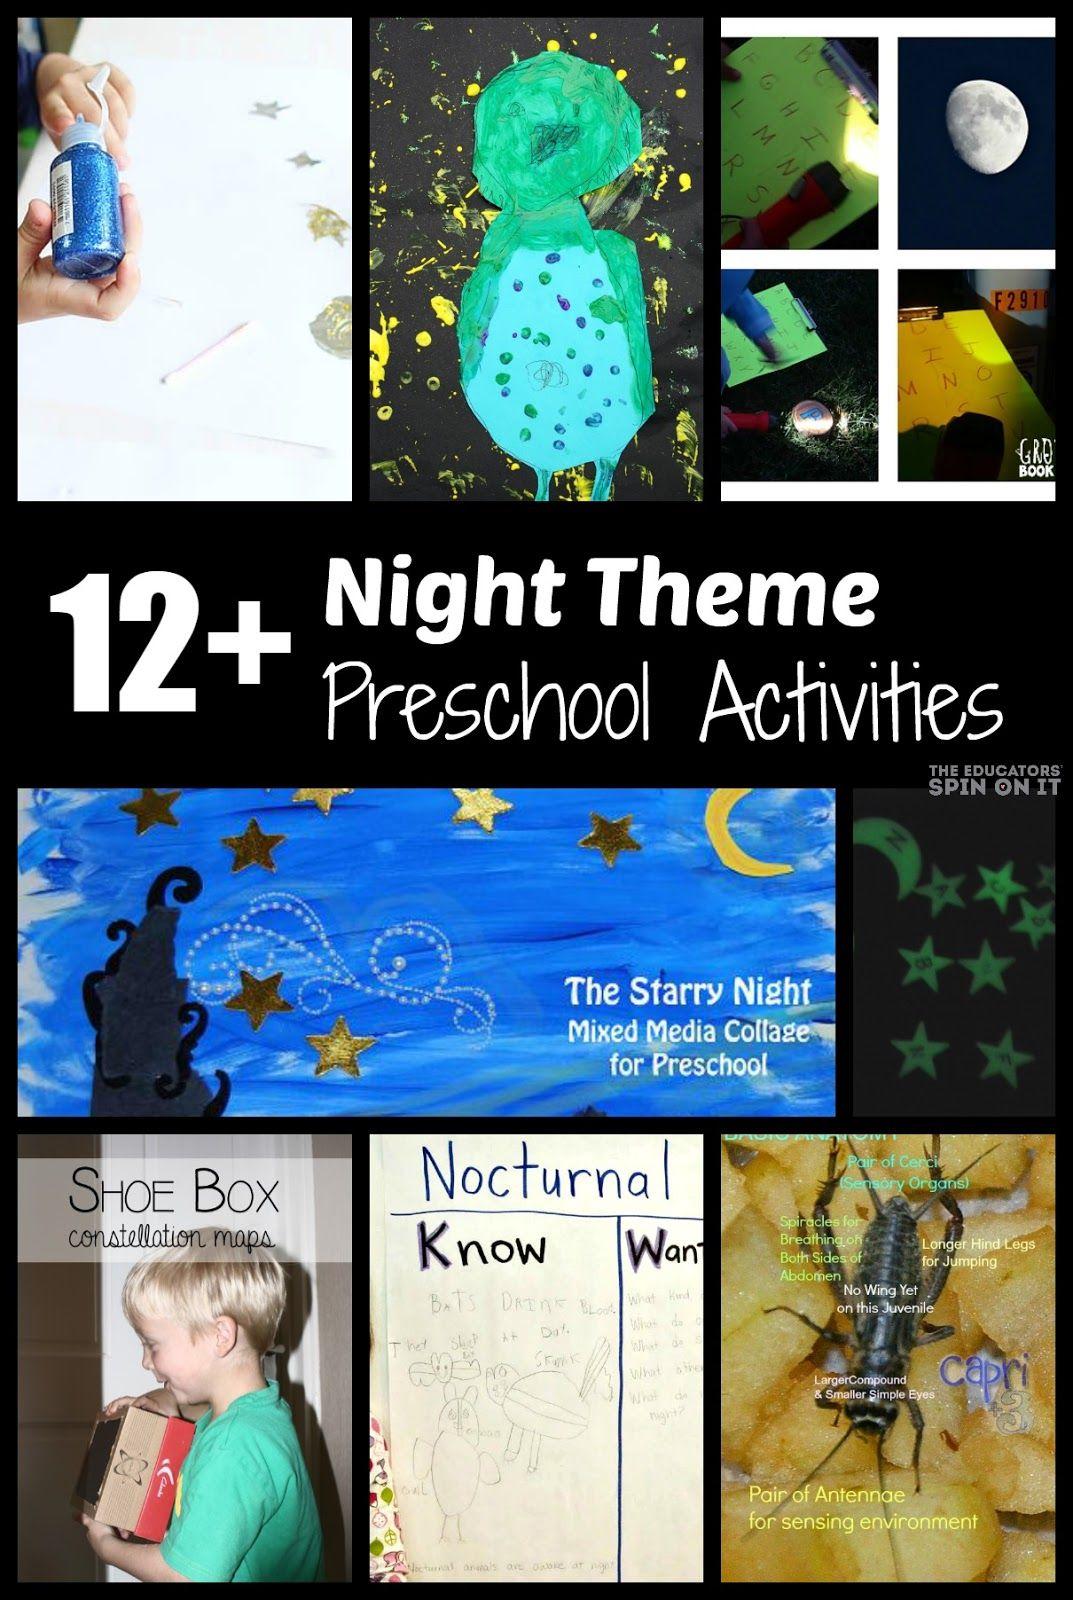 Nighttime Preschool Activities: Night Owl Painting and Books ...